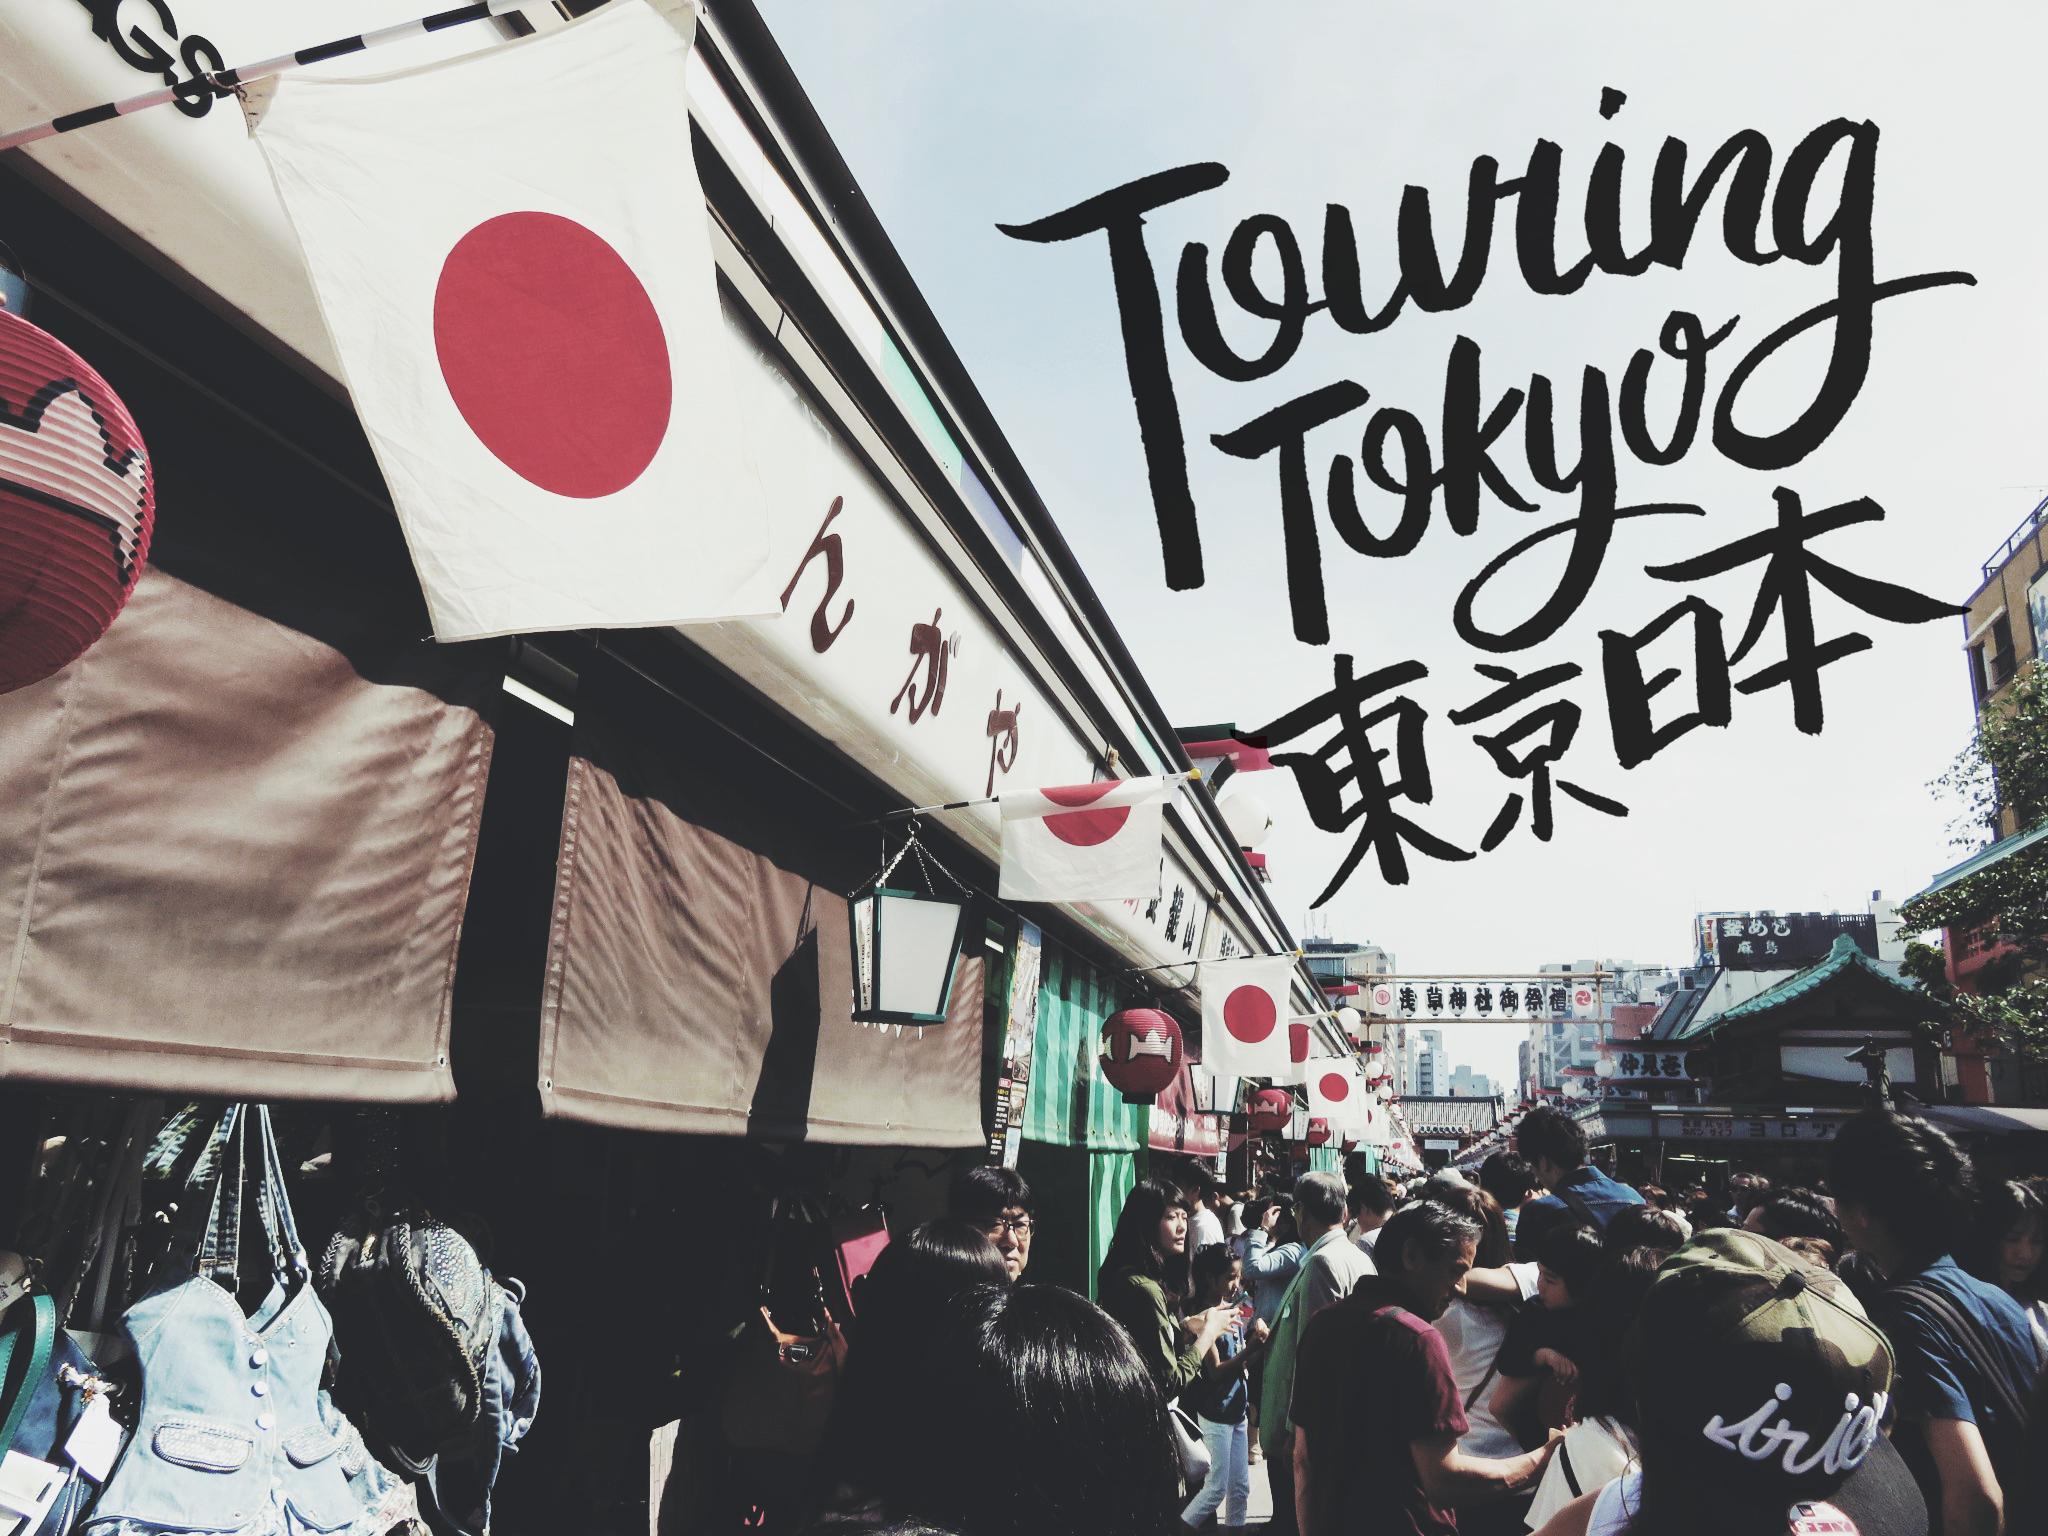 Tokyocover